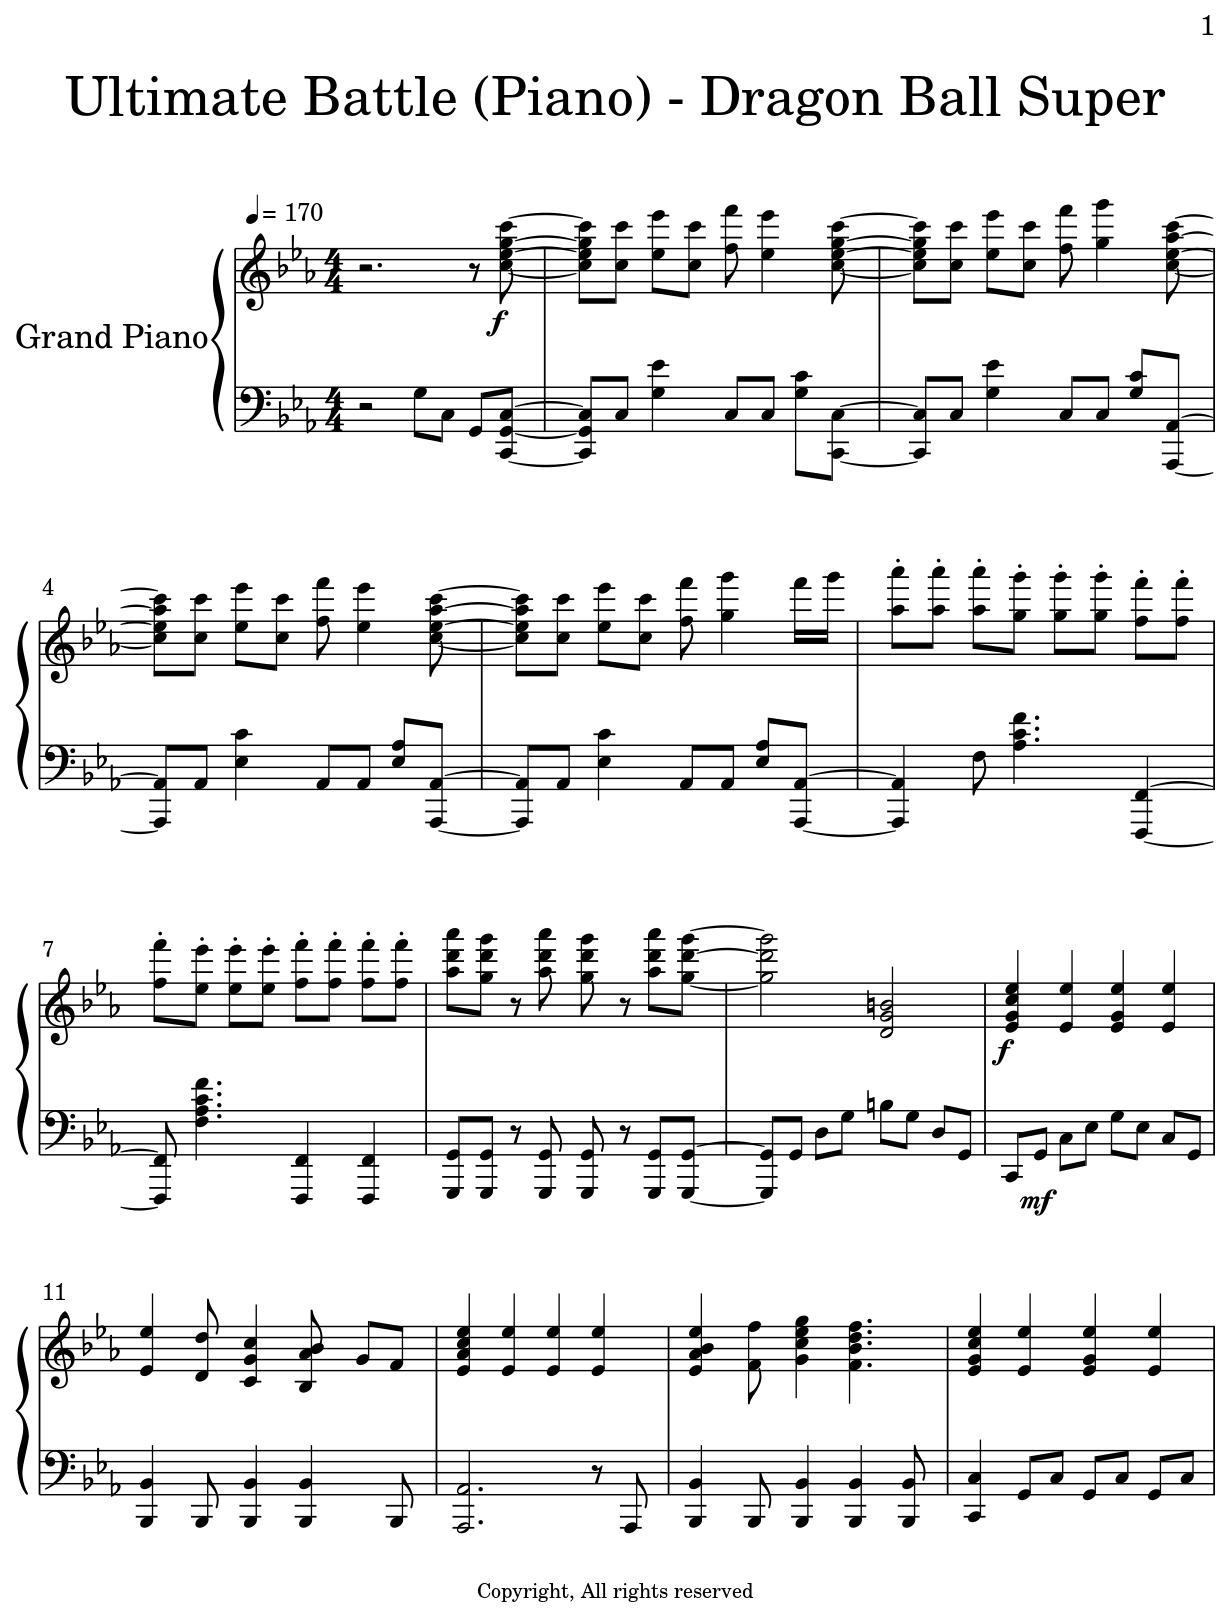 Ultimate Battle (Piano) - Dragon Ball Super - Sheet music